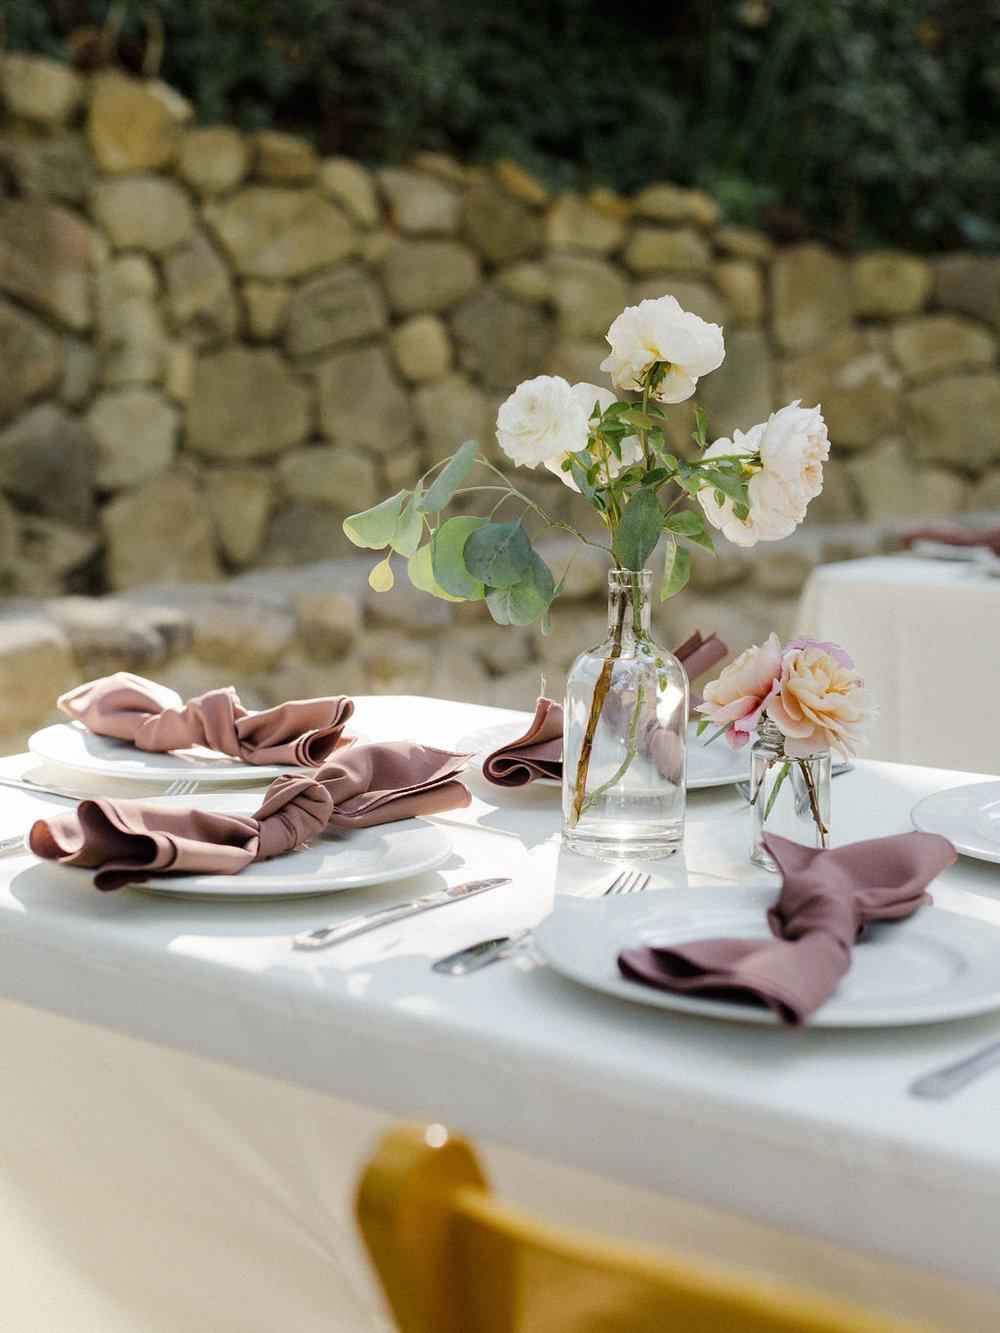 www.santabarbarawedding.com   Cold Spring Tavern   Wunderland & Co.   Braden Young   Reception Table Details